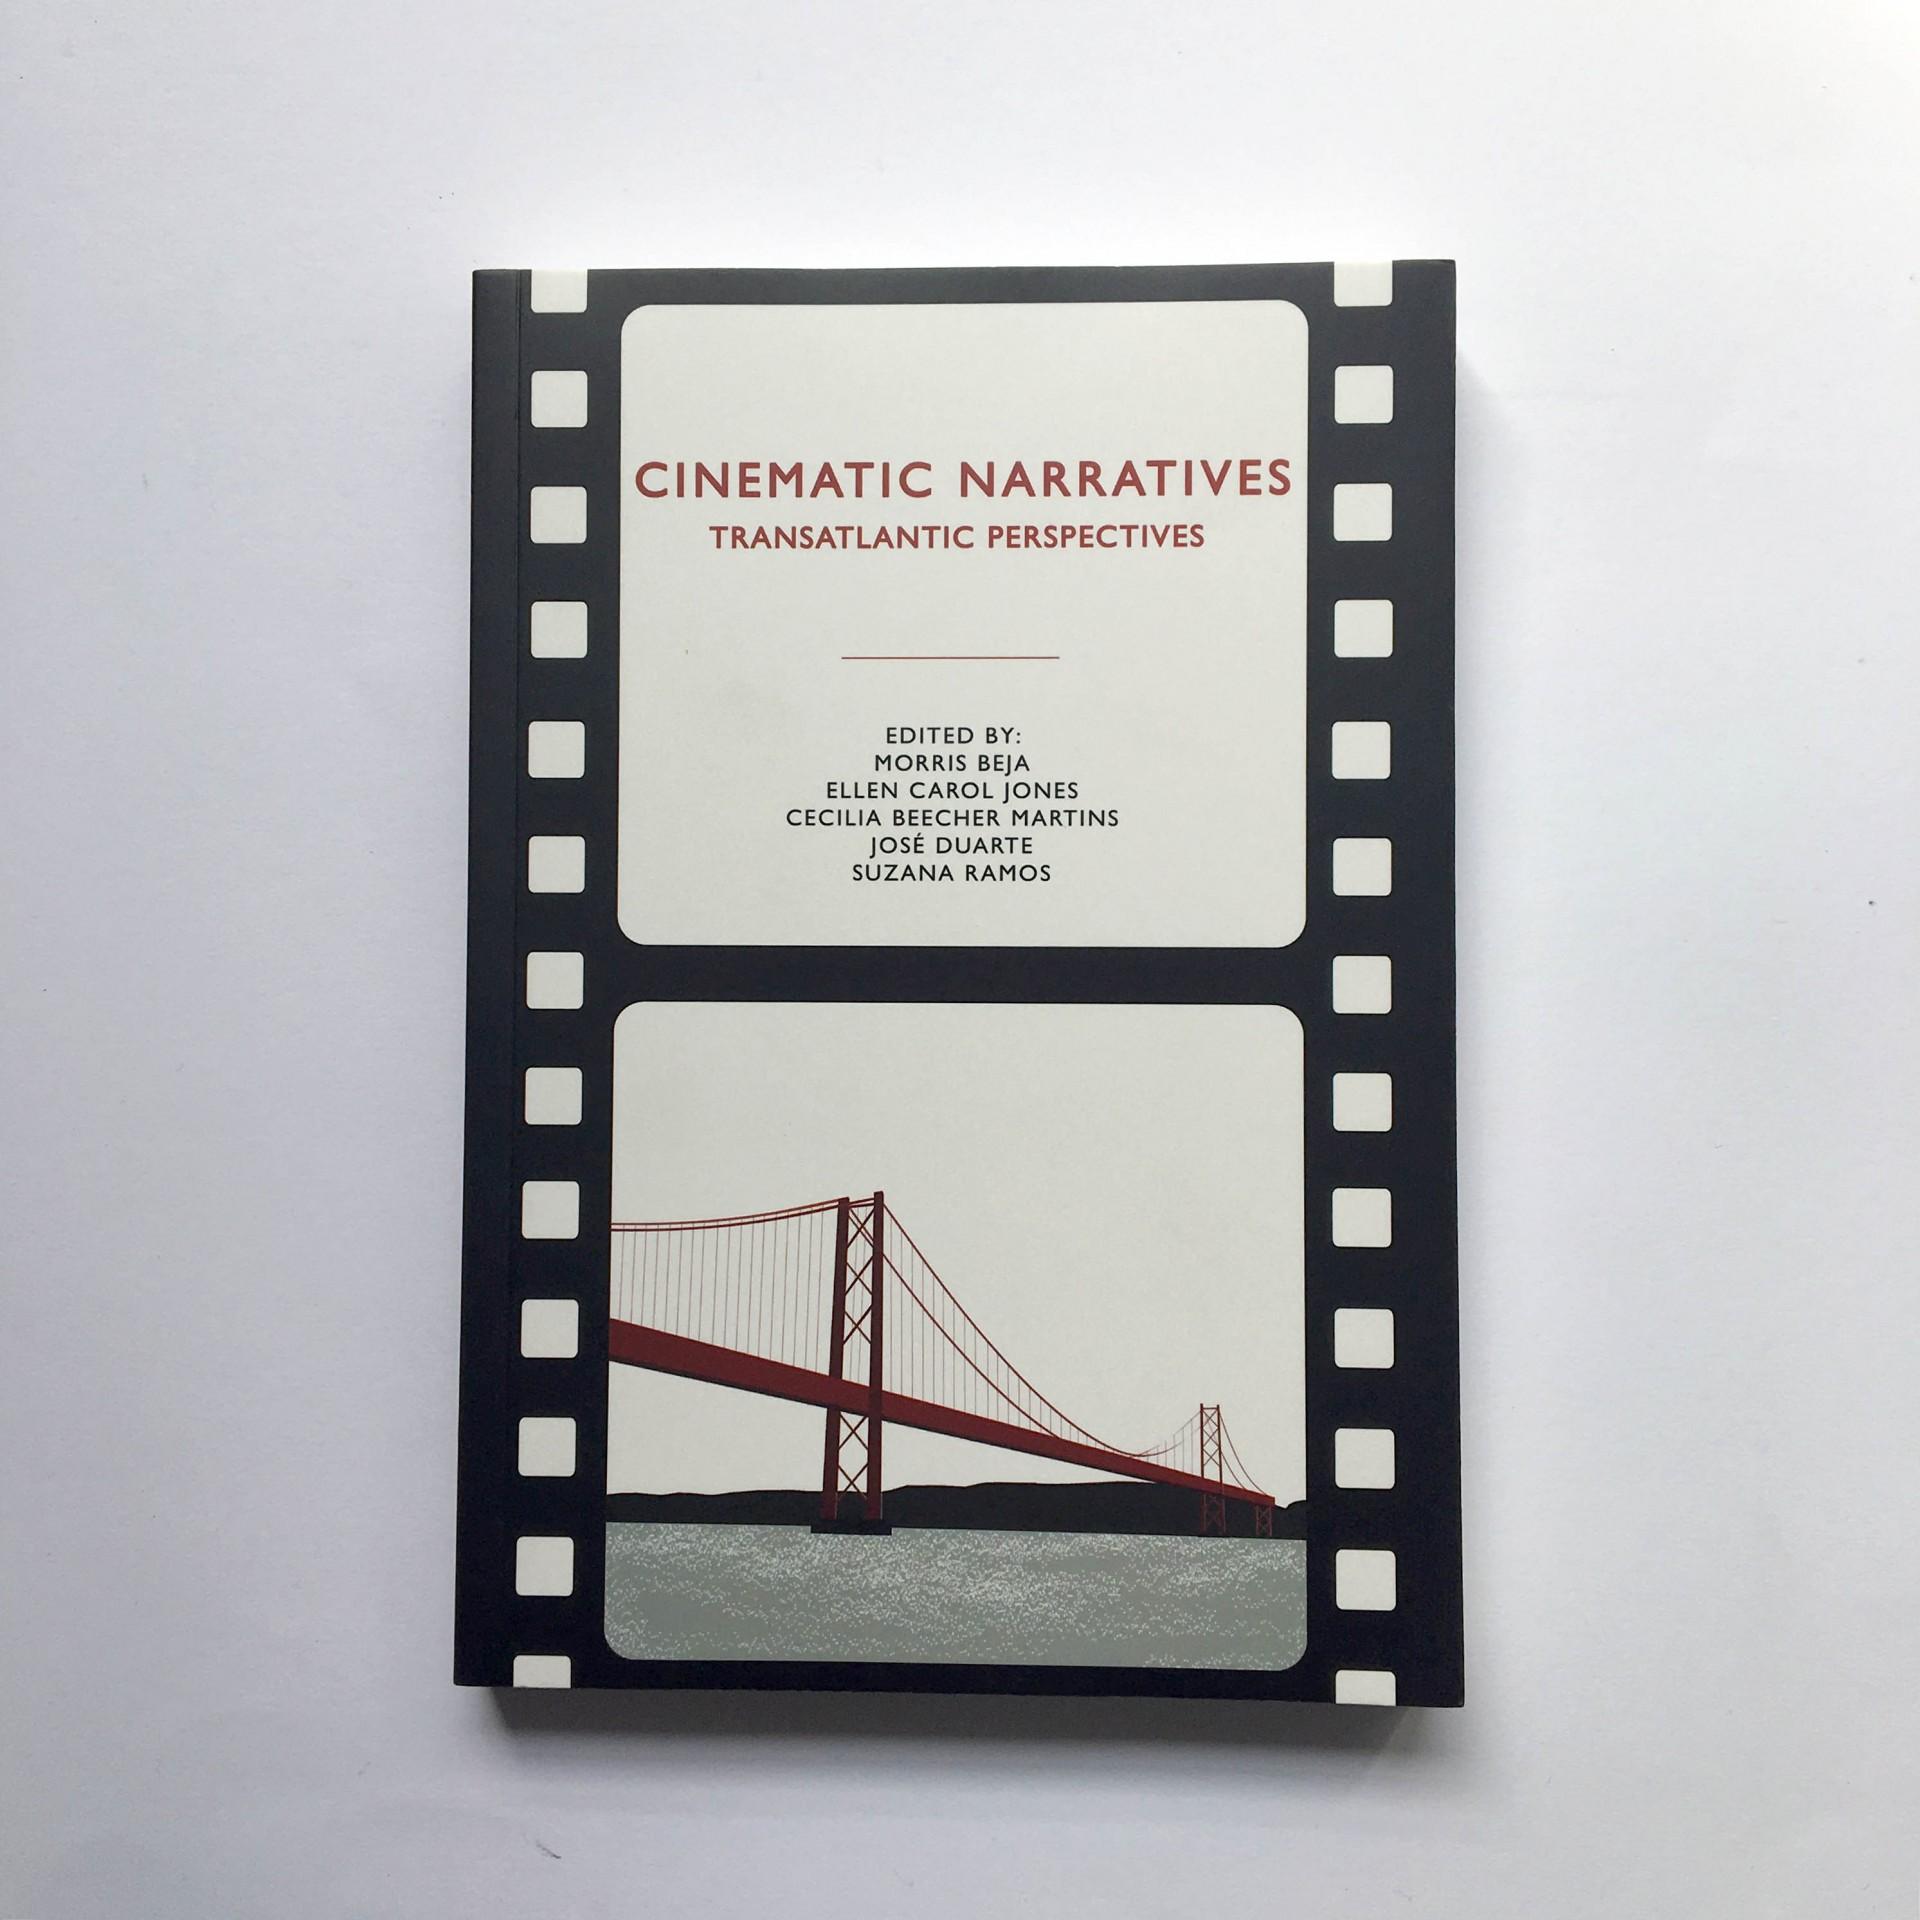 Cinematic Narratives - Transatlantic Perspectives